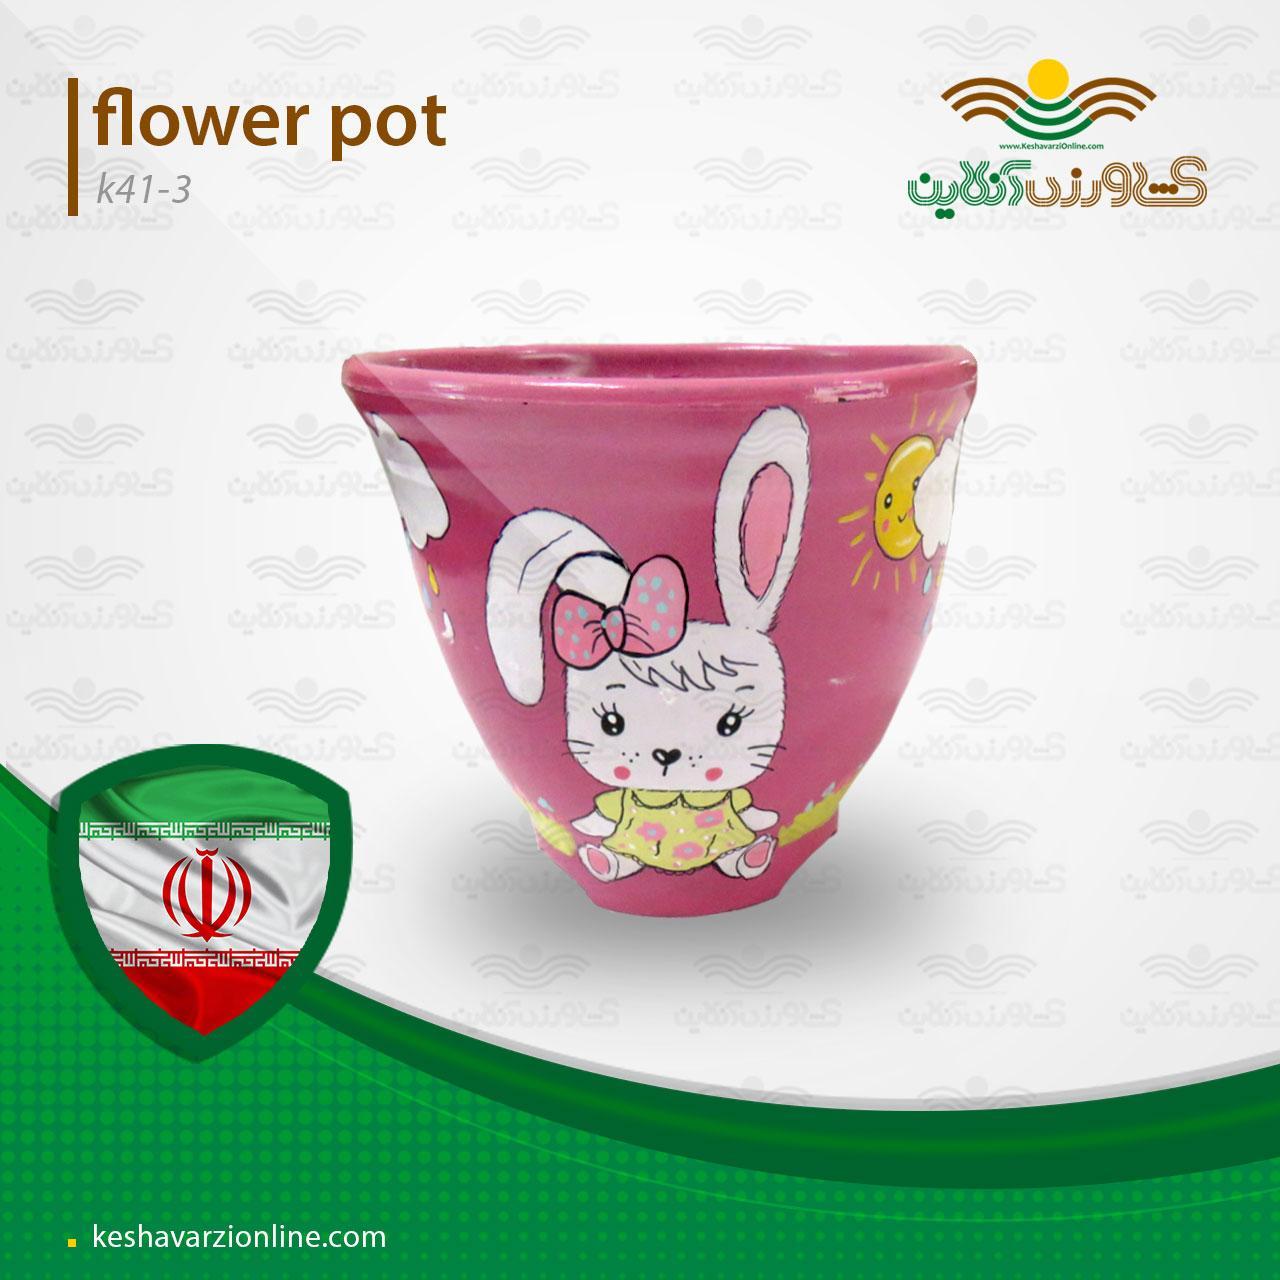 گلدان دکوری K41.3